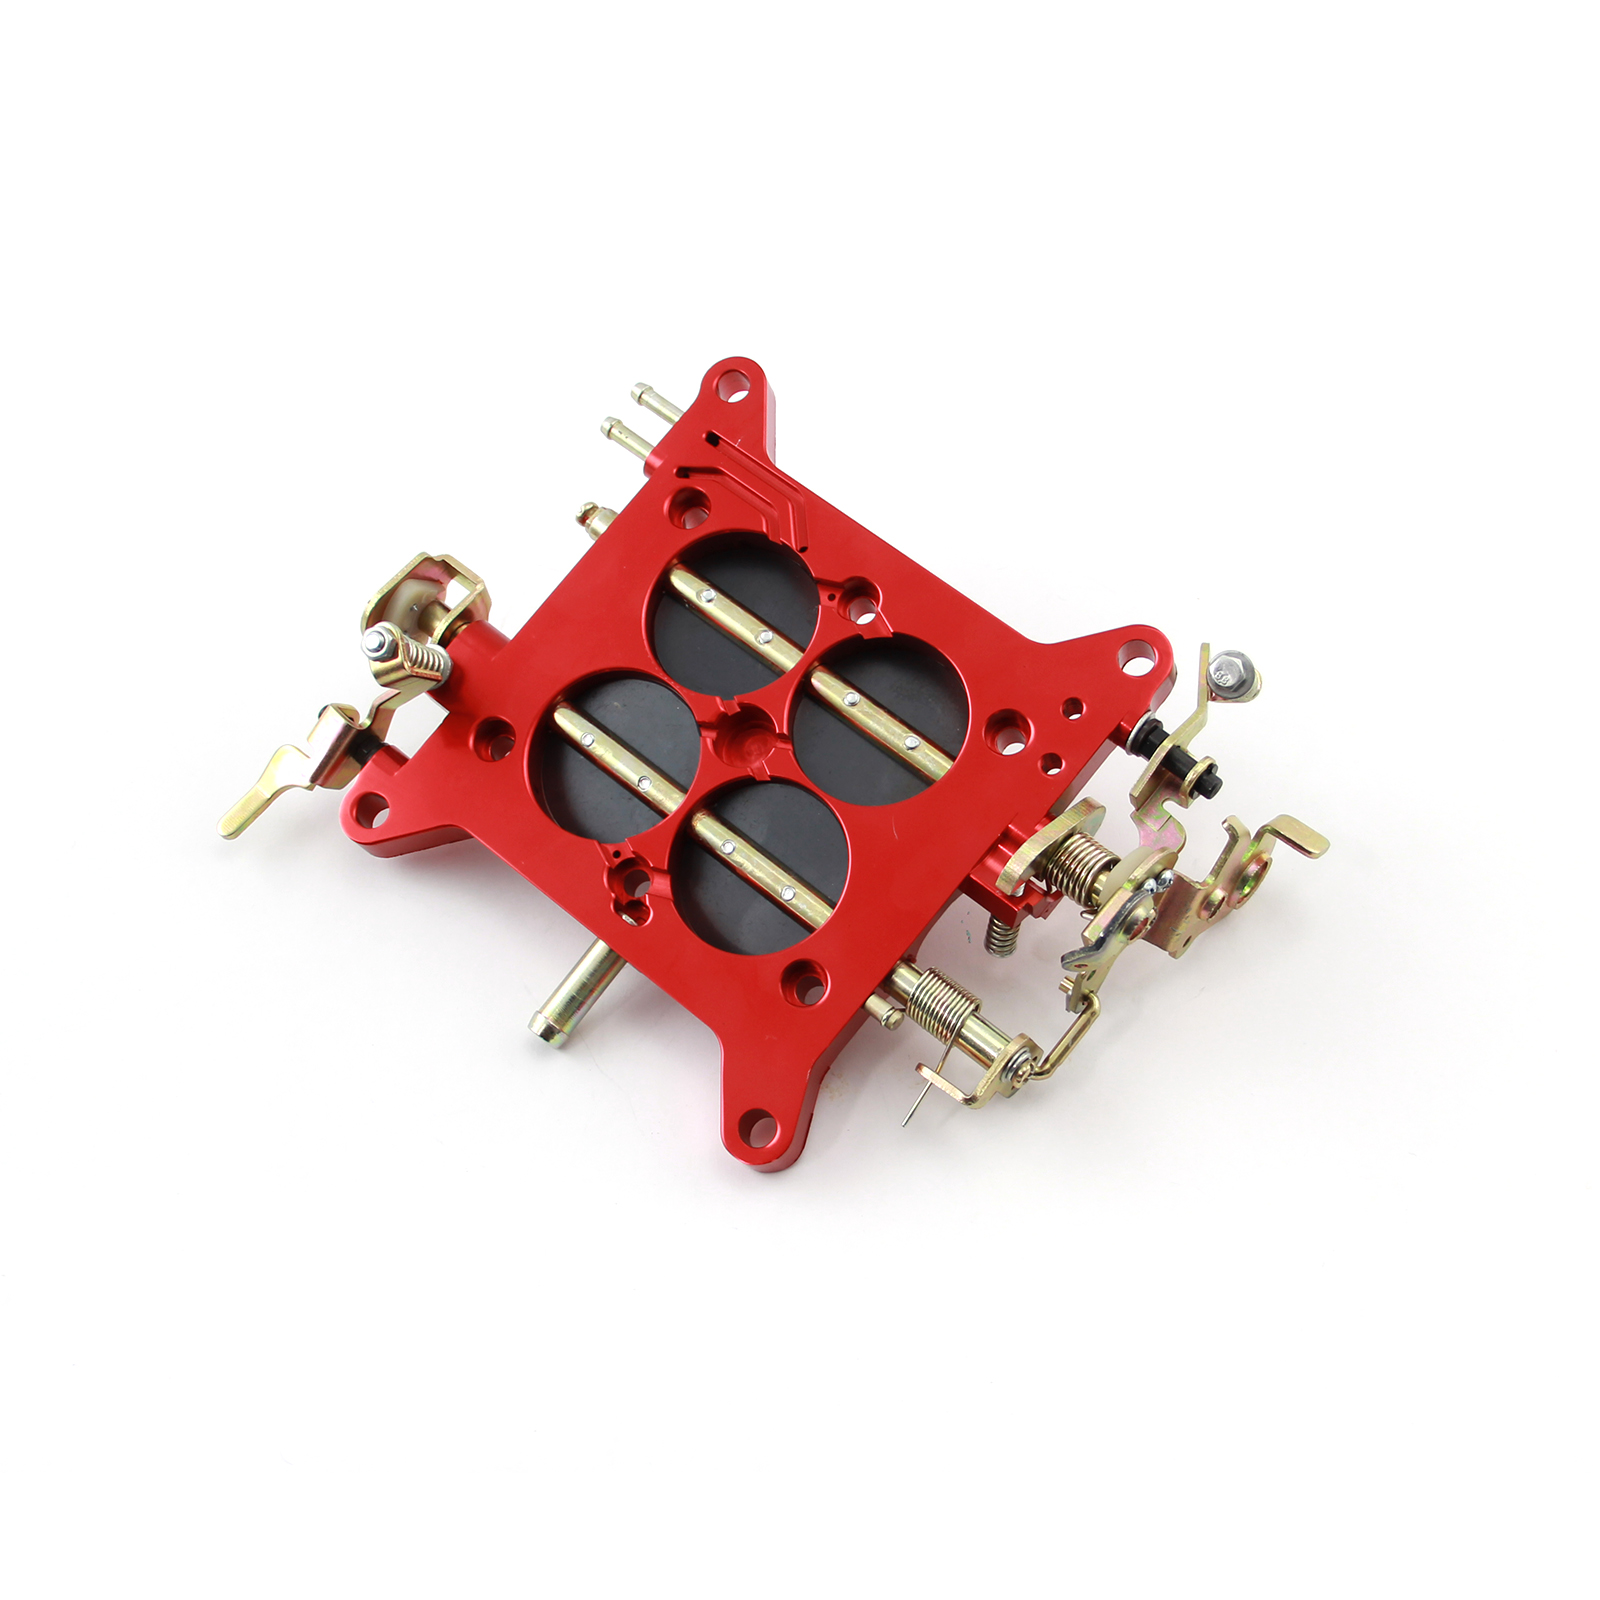 Billet Aluminum Carburetor Base Plate 850-950Cfm Holley Quickfuel Double Pumpers